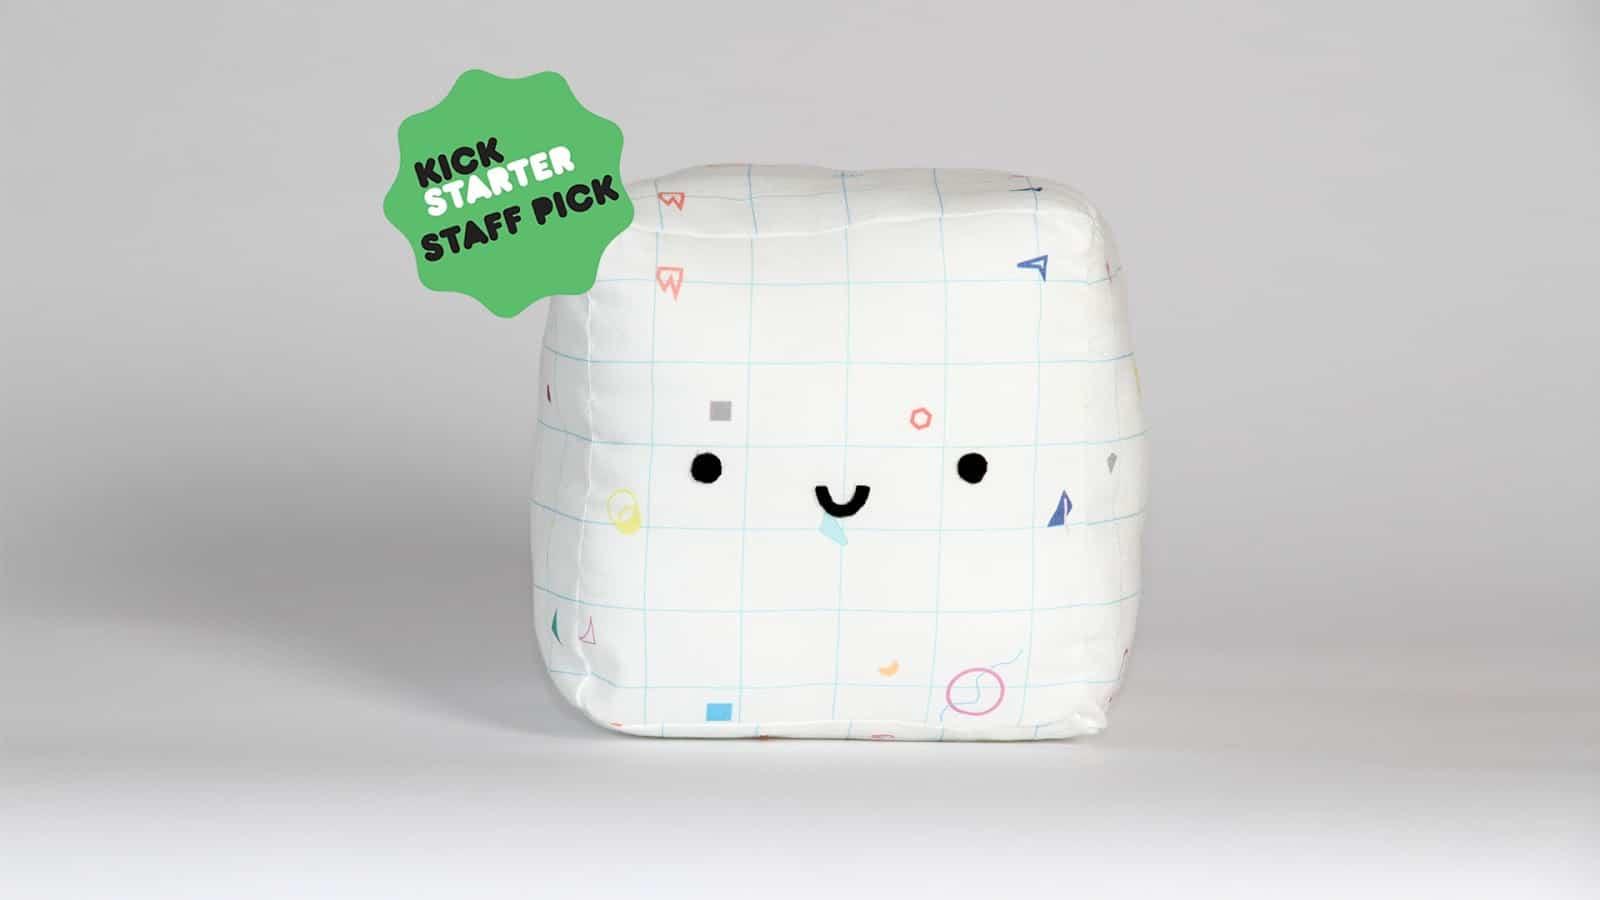 Prismland Kickstarter Picture: STEM Stuffie